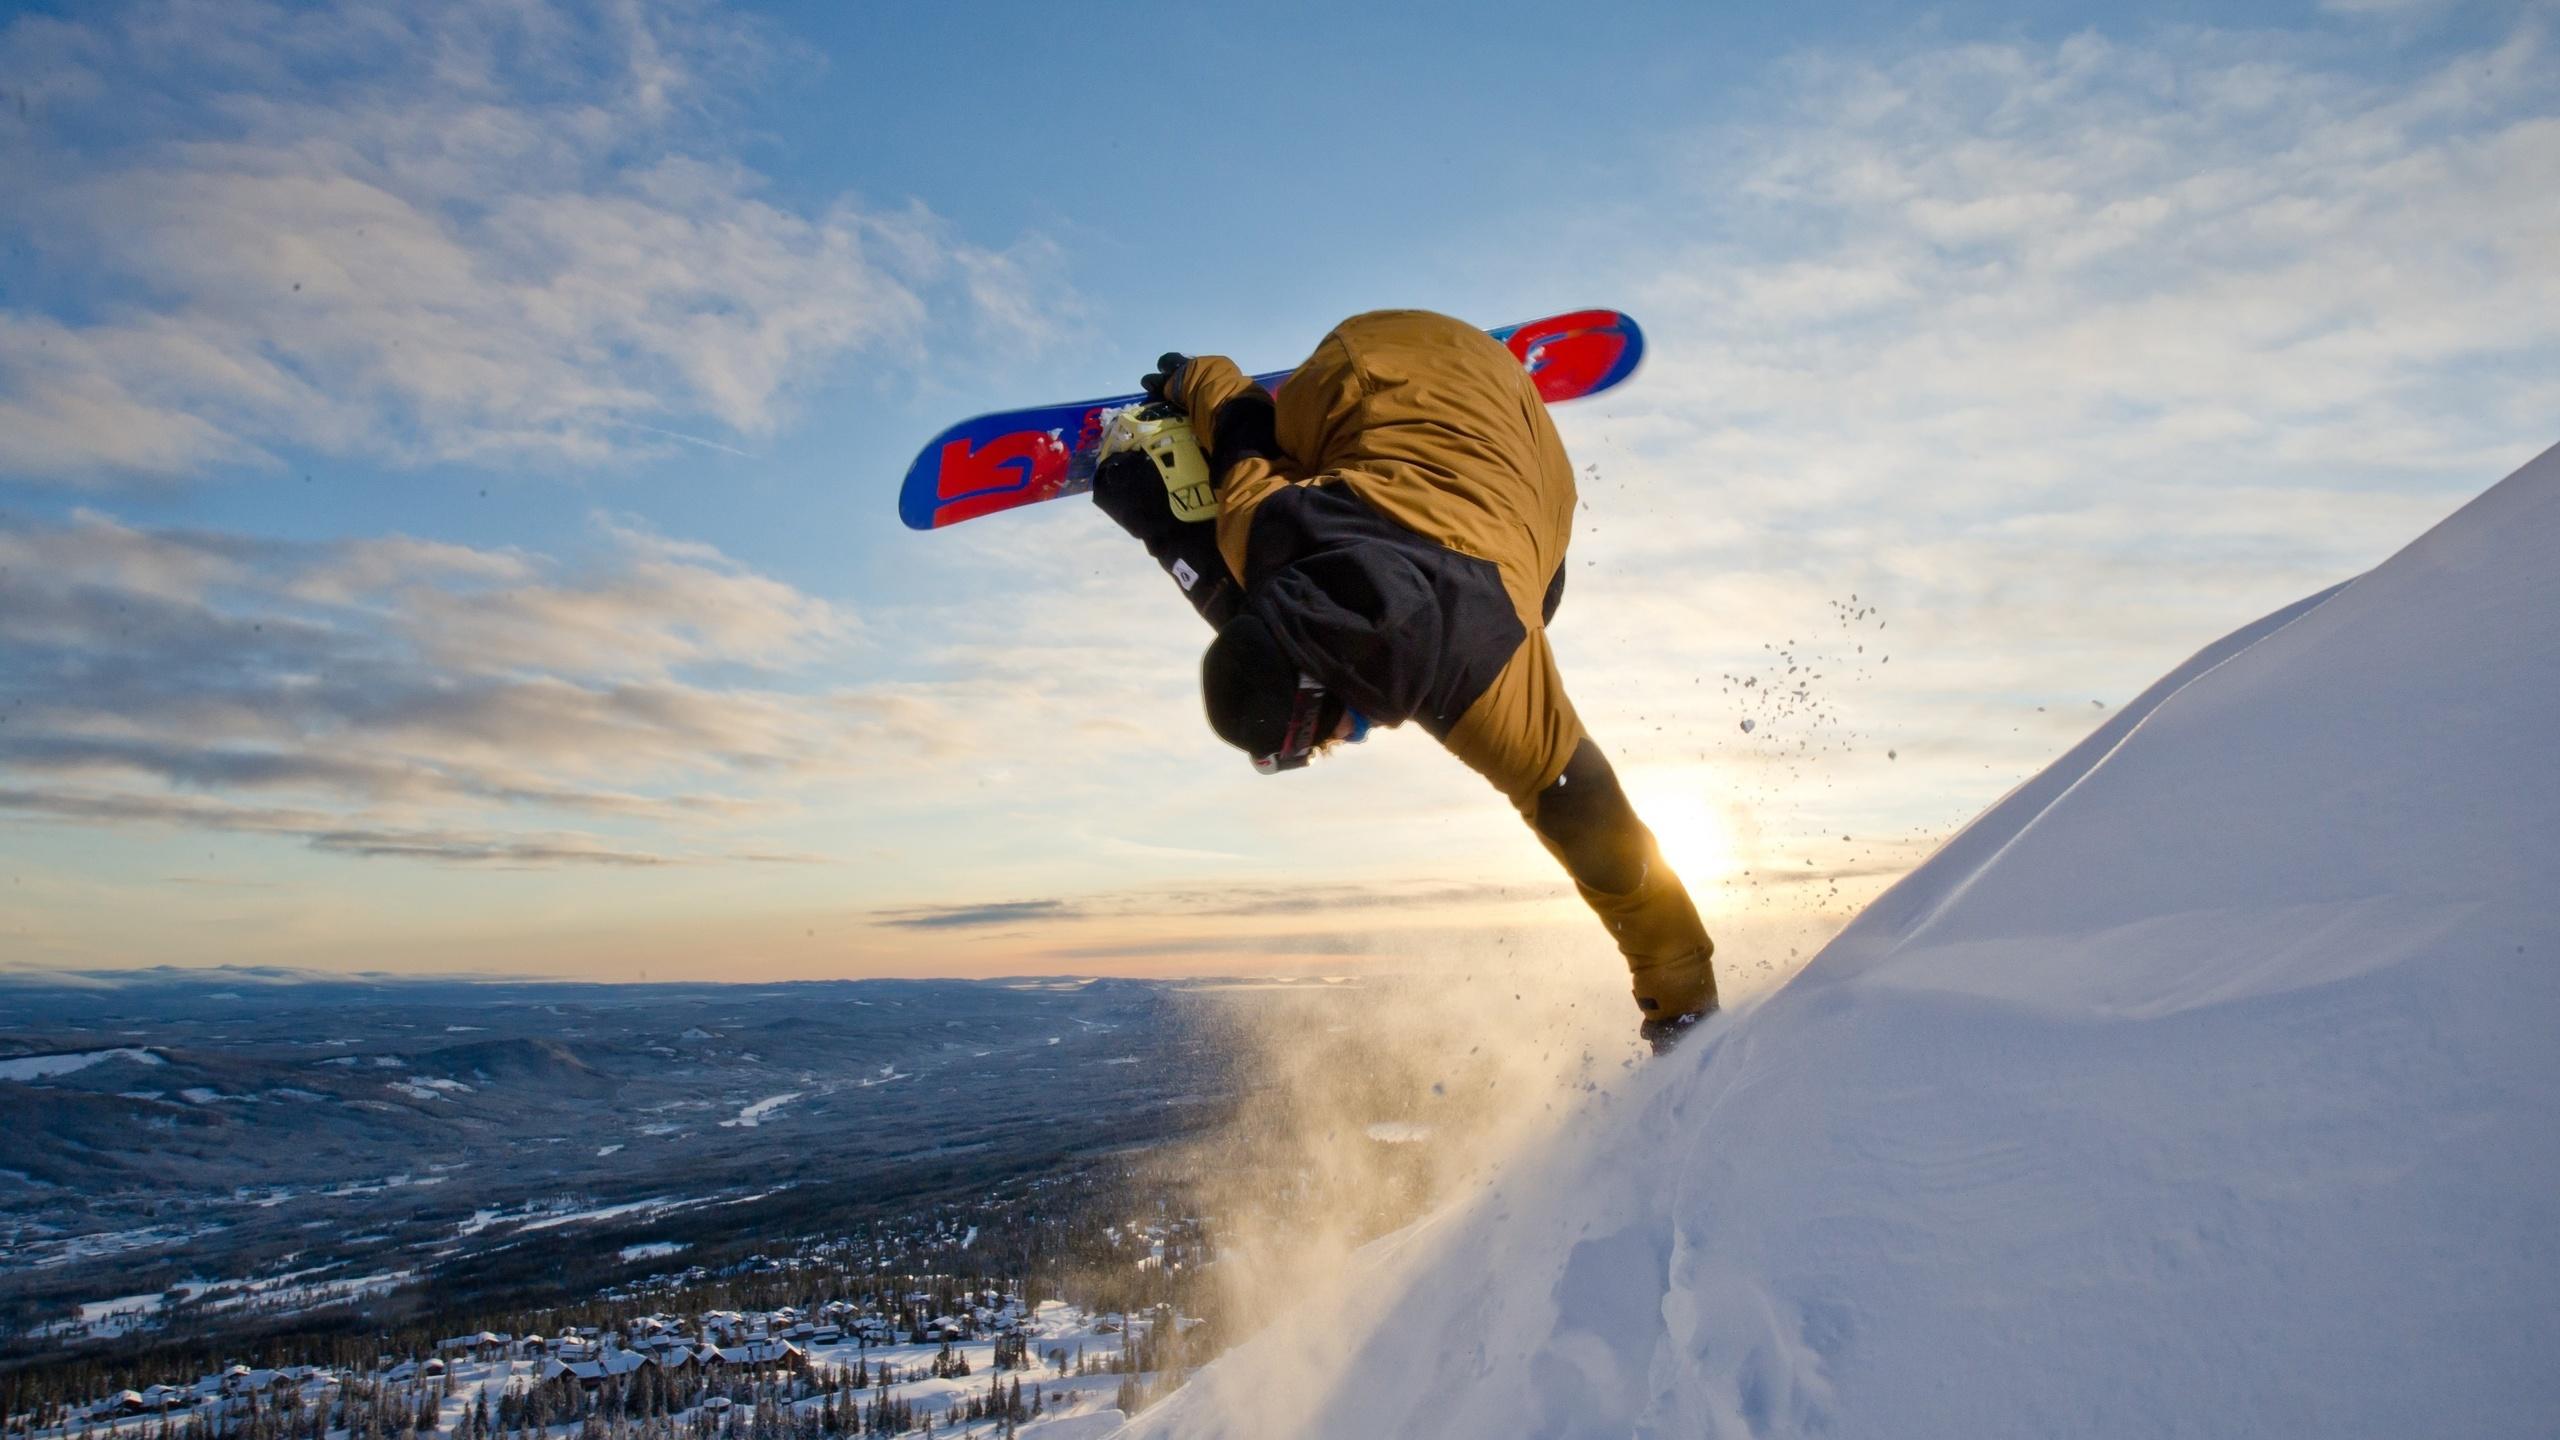 Картинки про сноубордистов